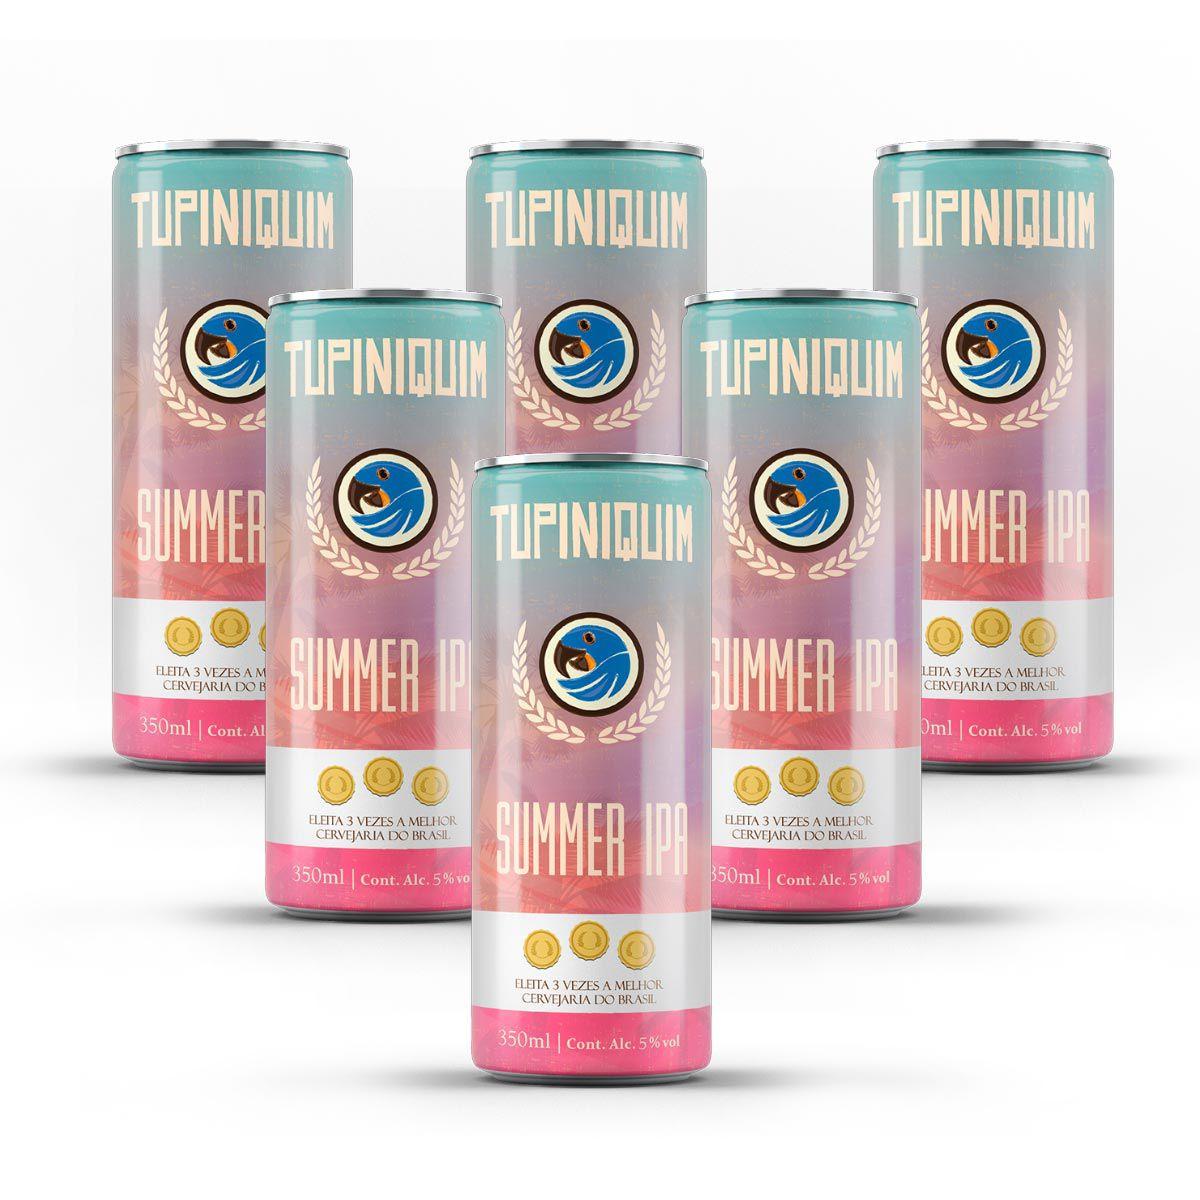 Pack Tupiniquim Summer IPA 6 latas 350ml